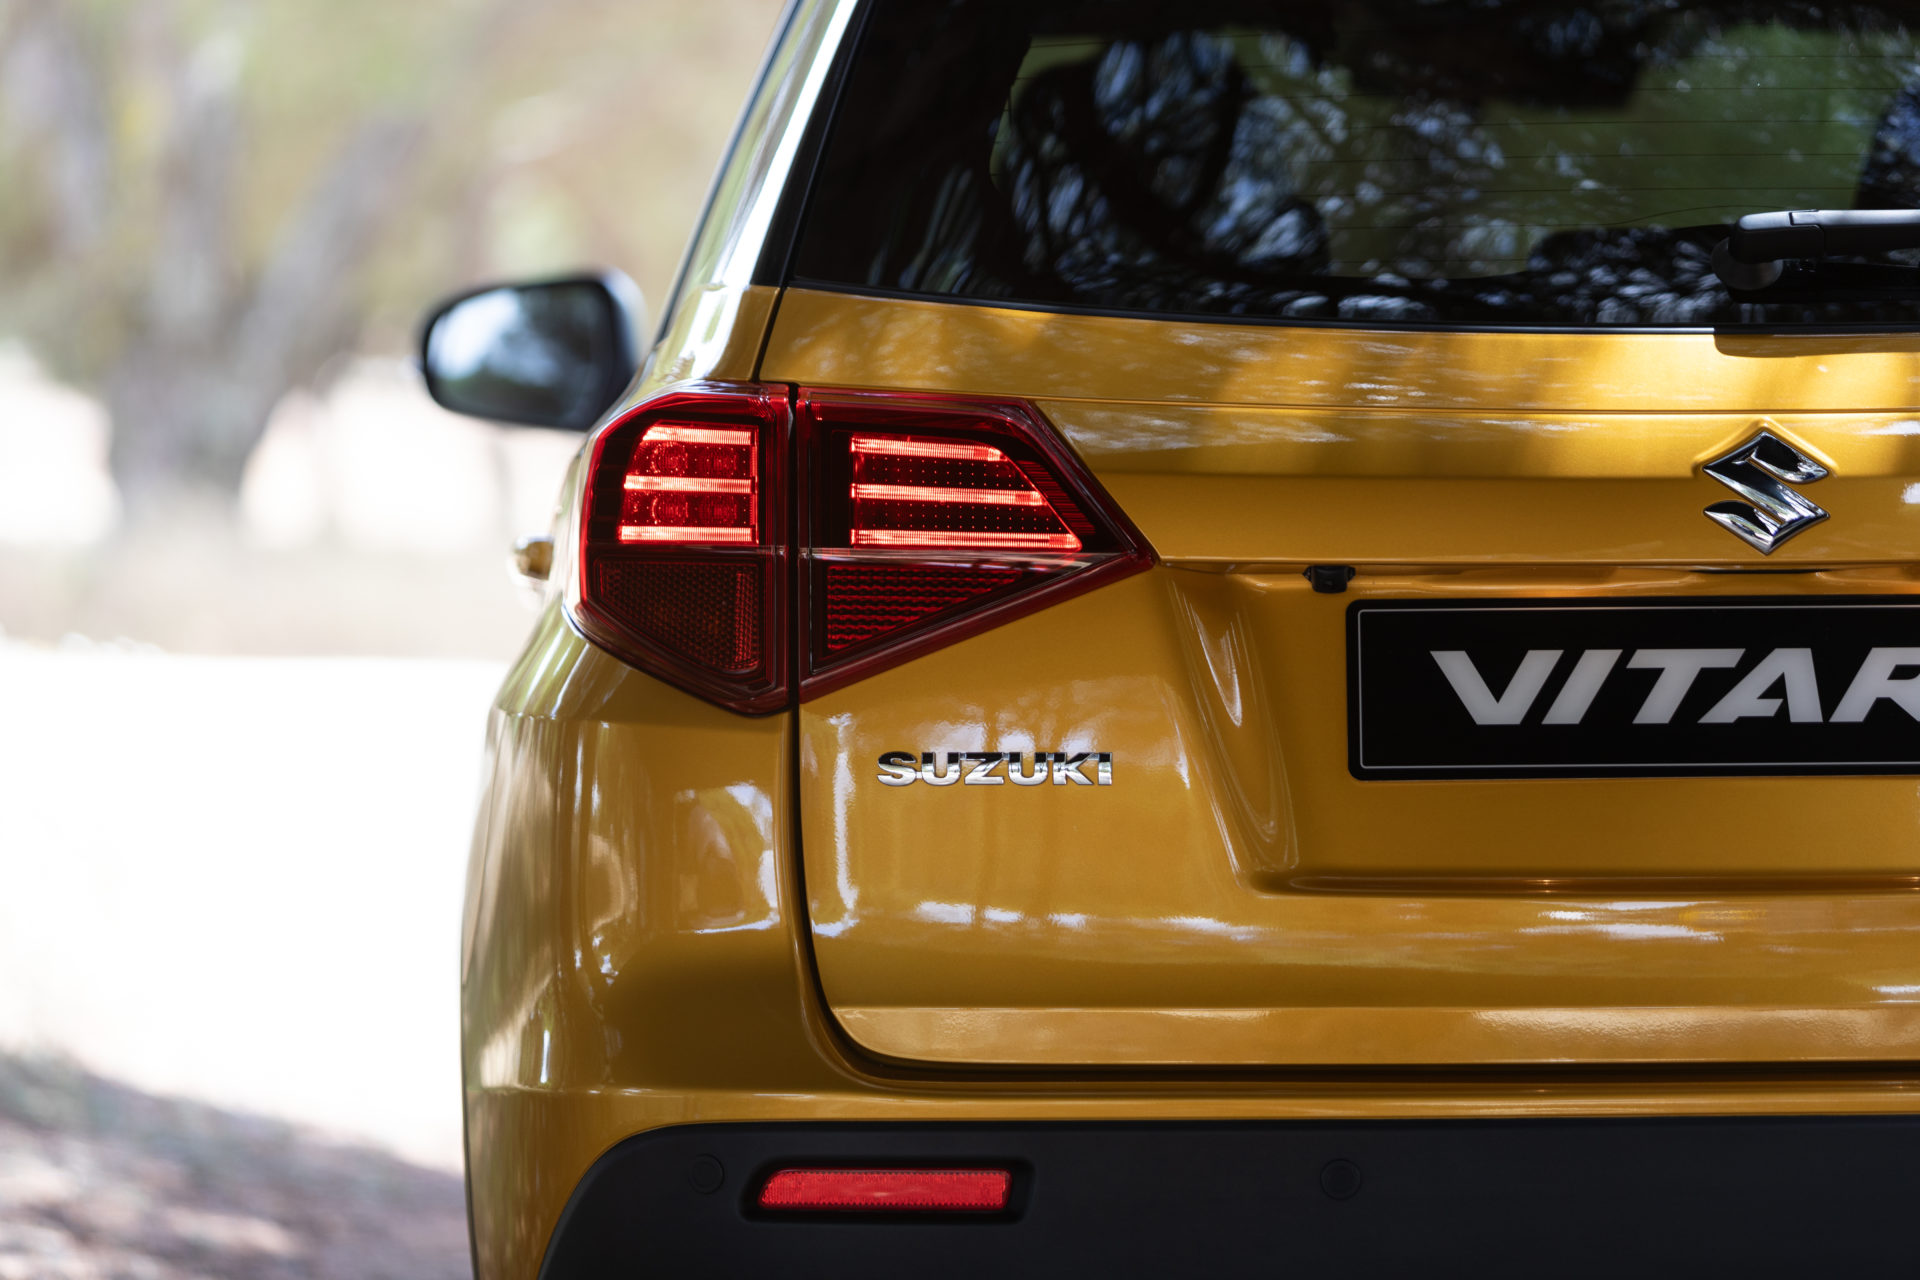 The 2019 Suzuki Vitara!